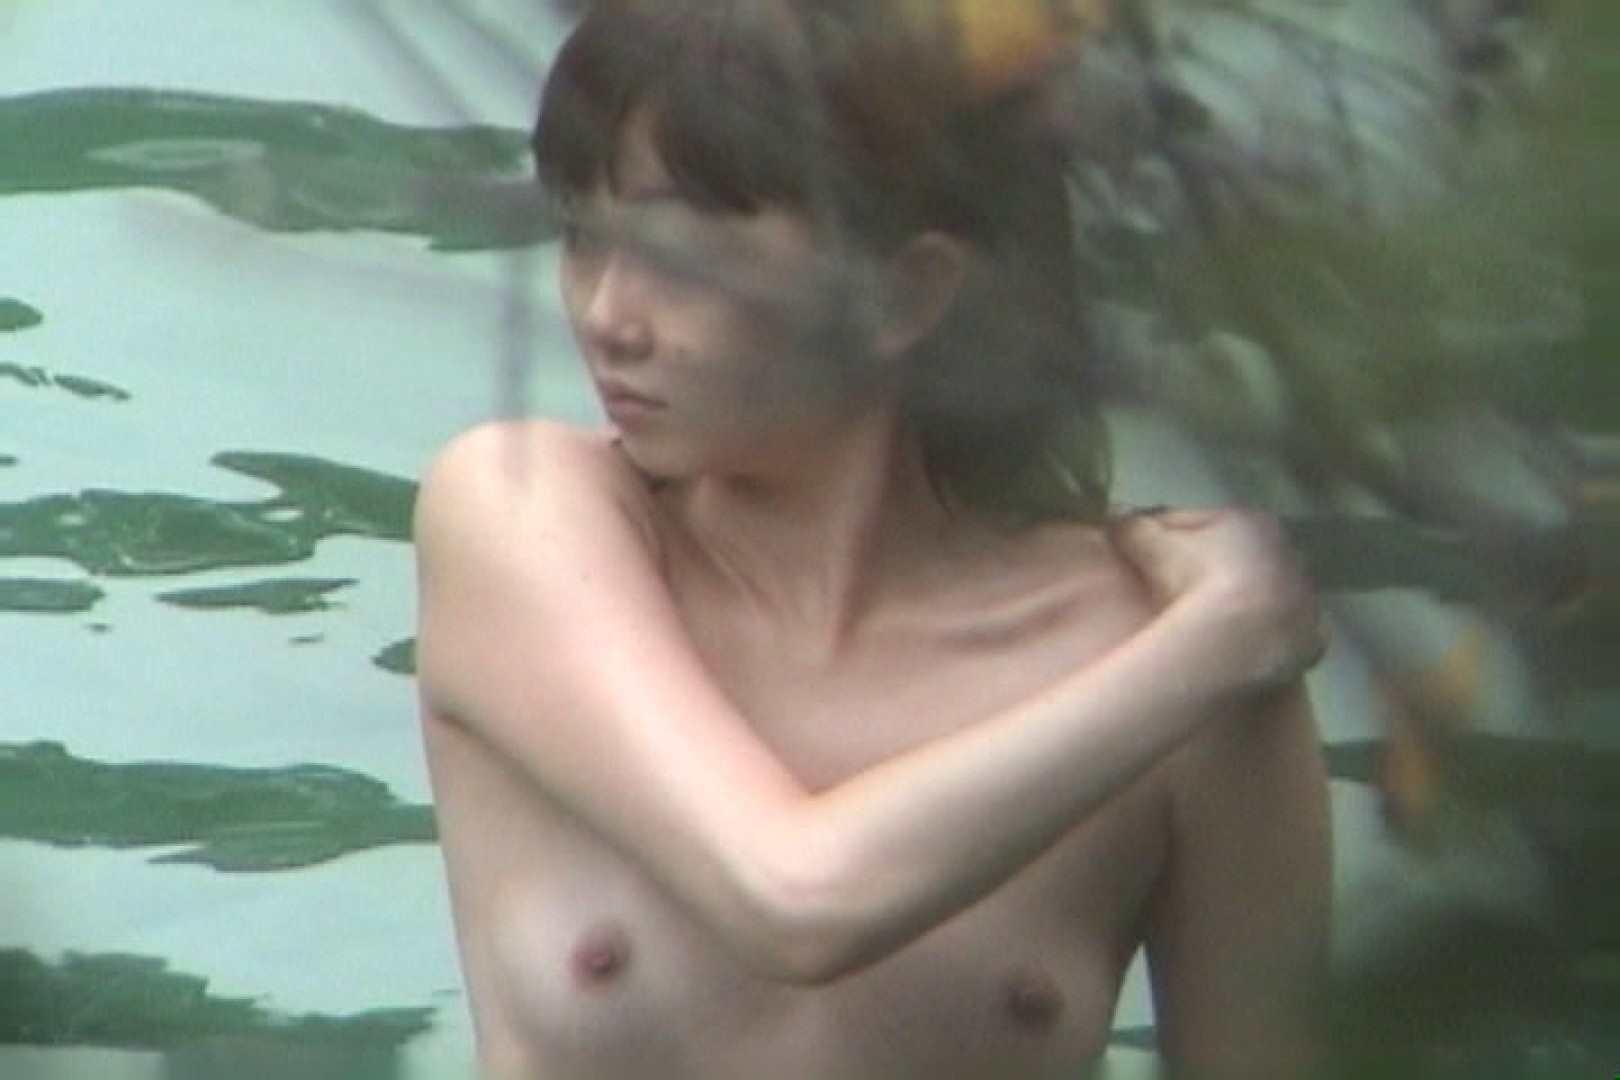 Aquaな露天風呂Vol.71【VIP限定】 0 | 0  107連発 81